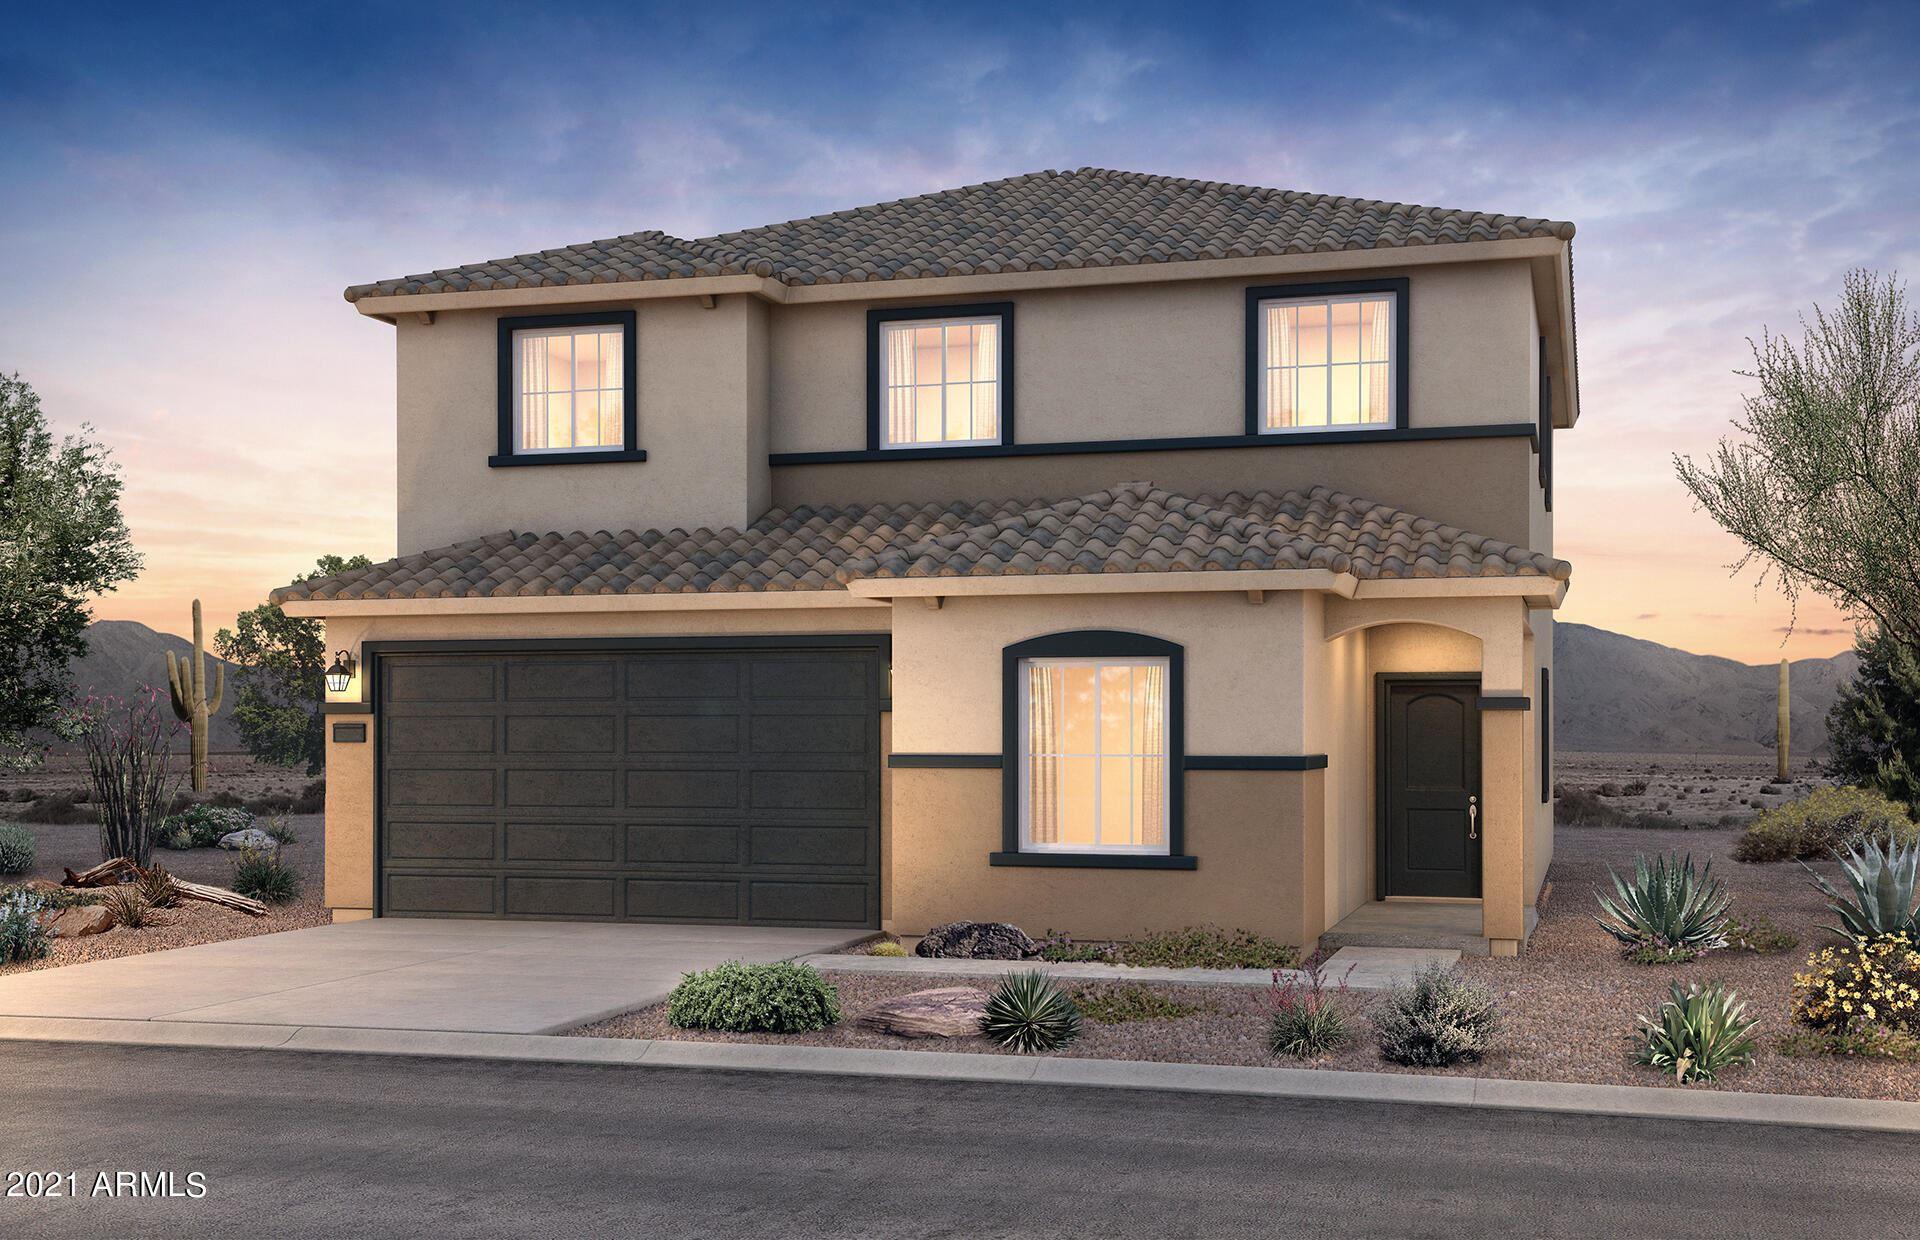 Photo for 18525 N LAKESIDE Drive, Maricopa, AZ 85138 (MLS # 6290491)